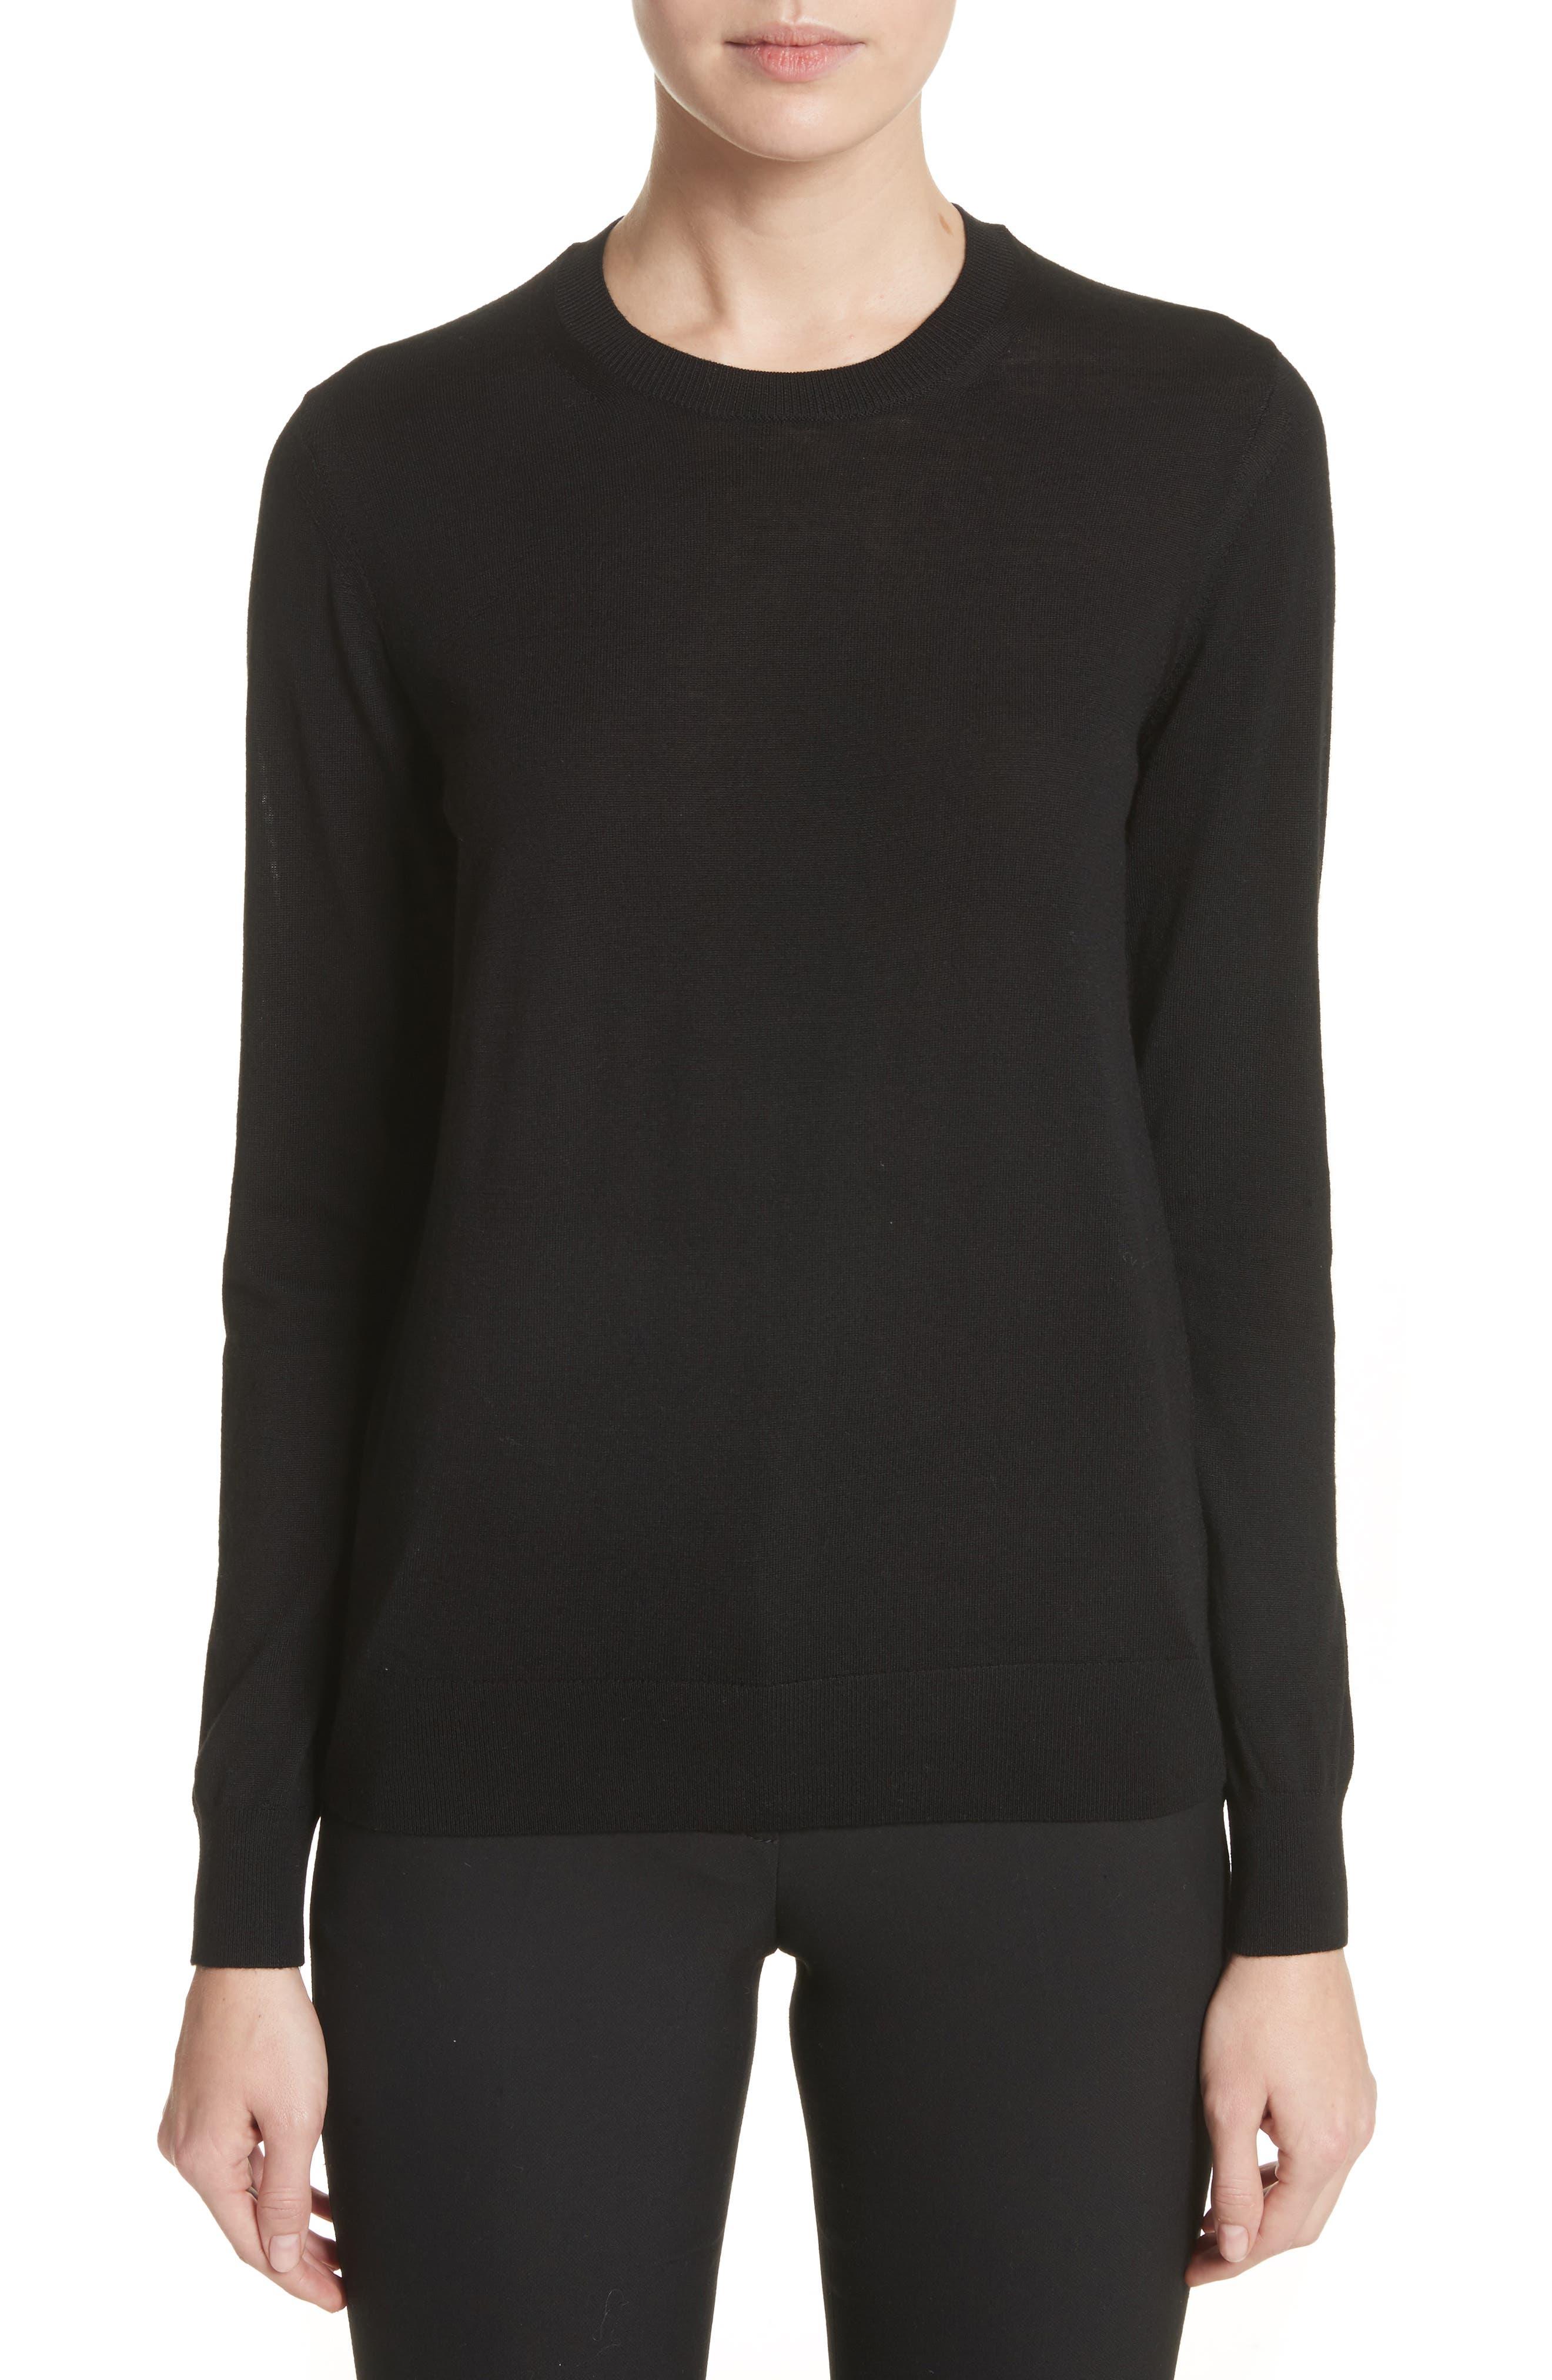 Viar Merino Wool Sweater,                         Main,                         color, 001